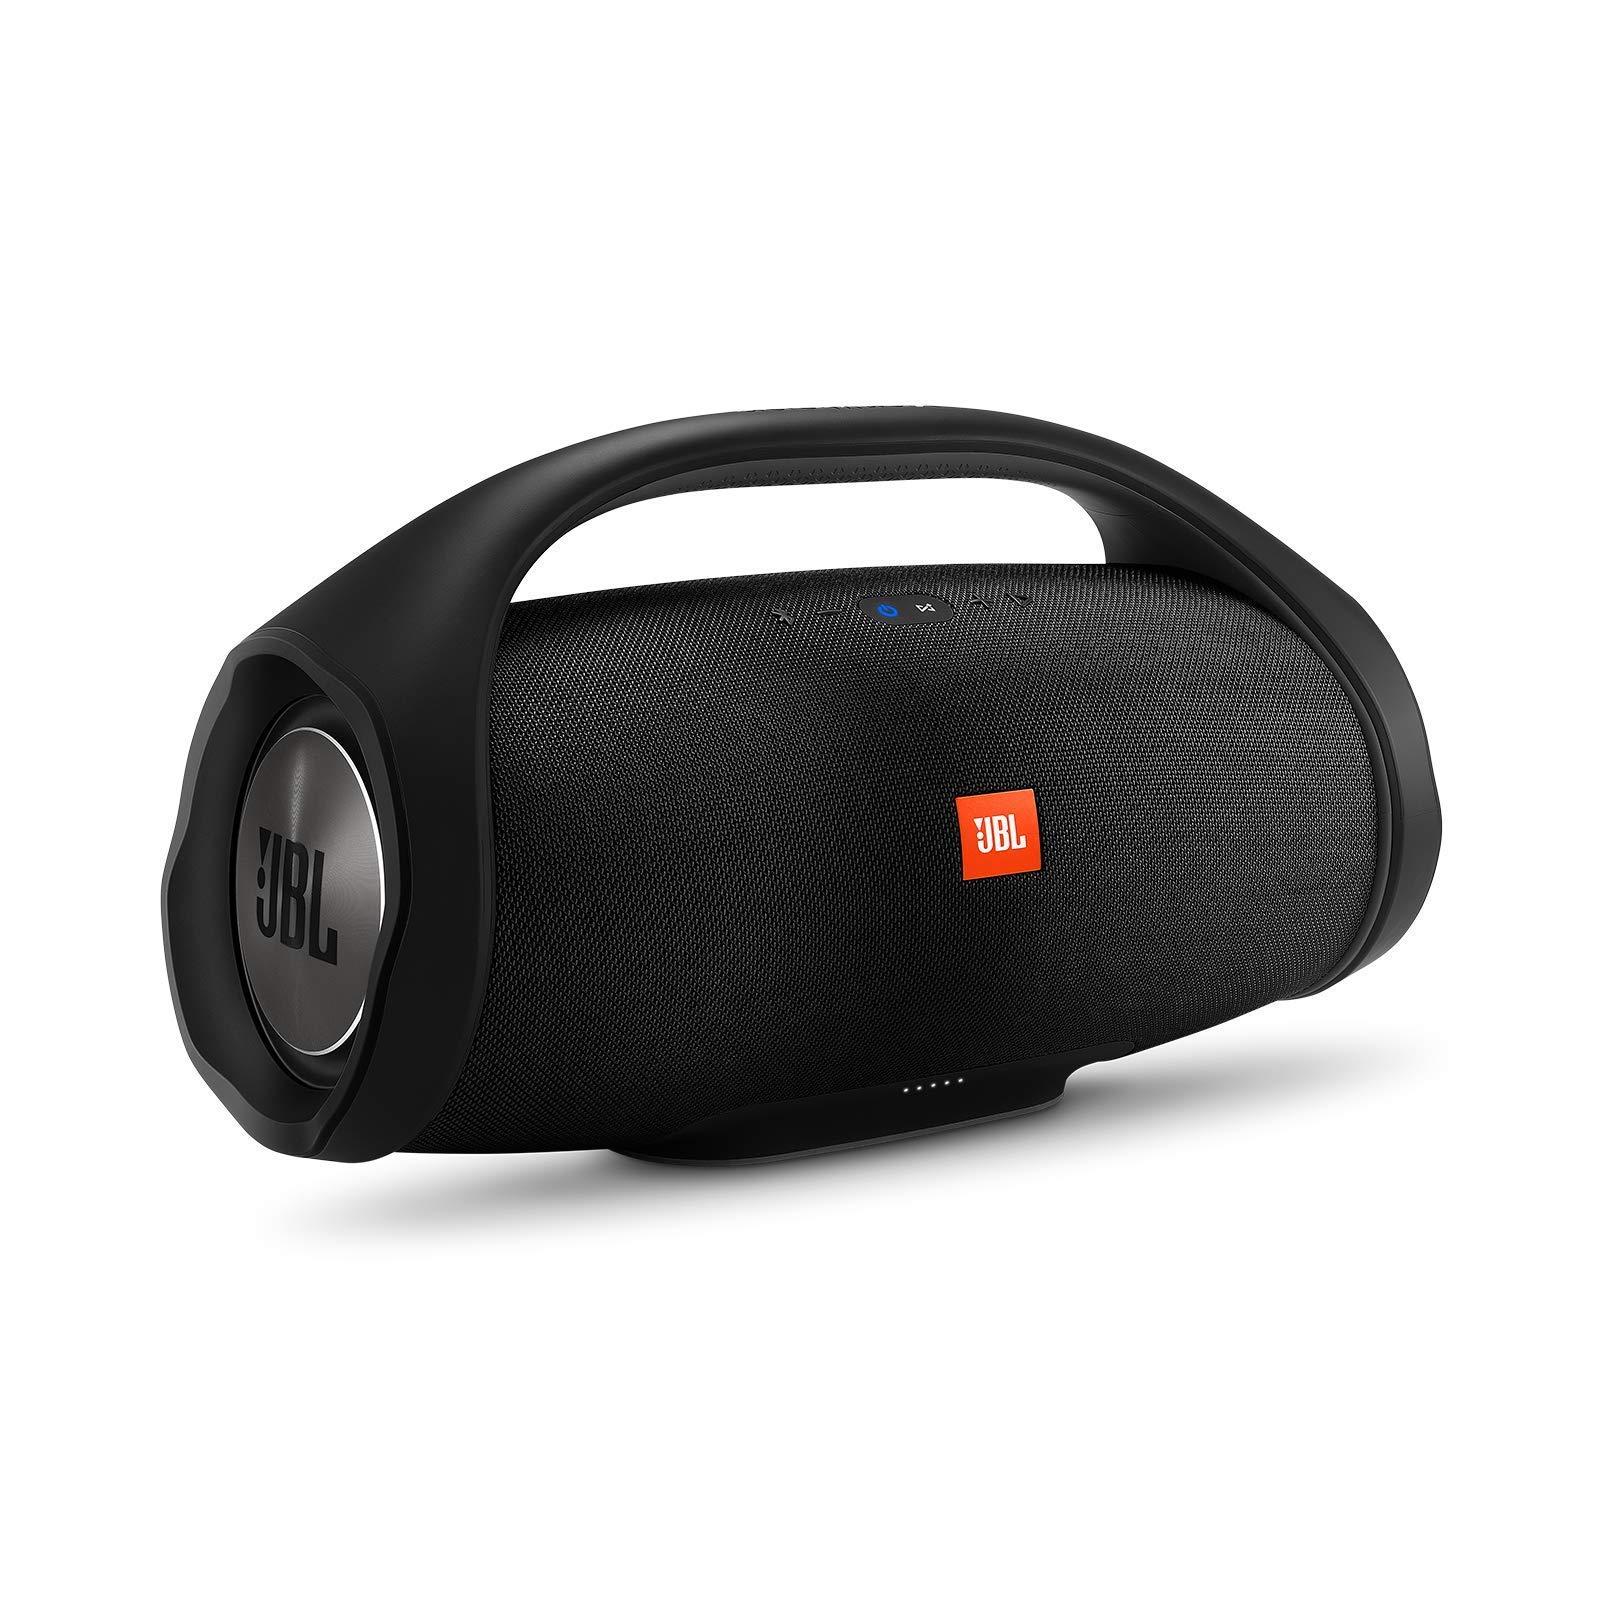 JBL Boombox Portable Bluetooth Waterproof